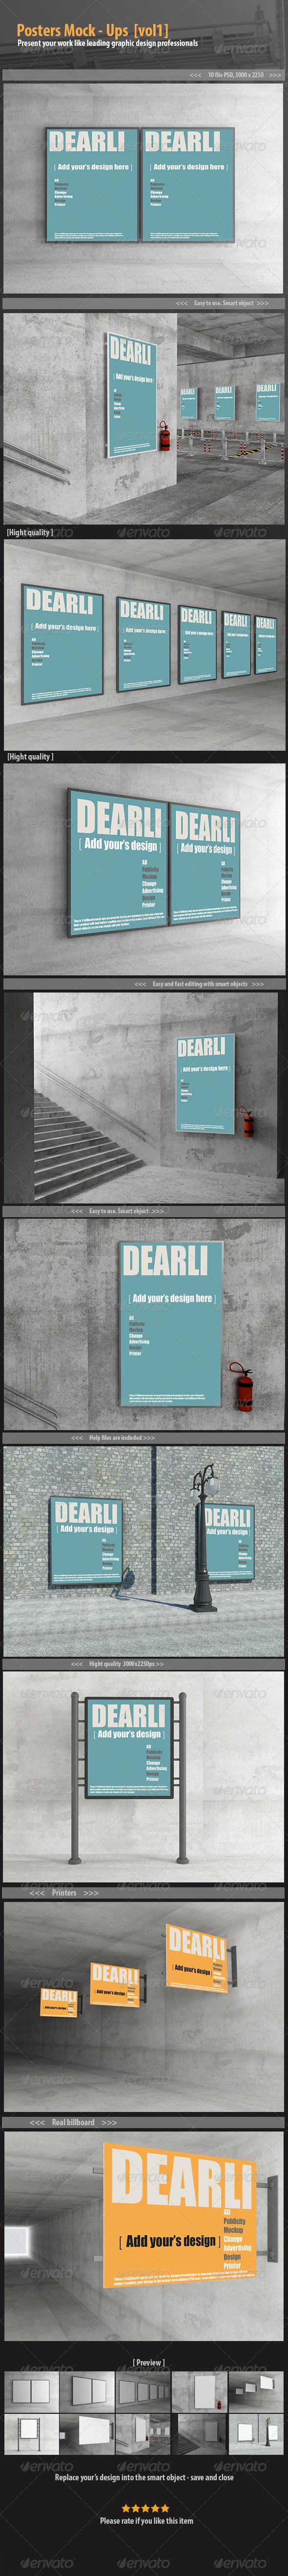 Poster Mock-Up [vol1] - Posters Print